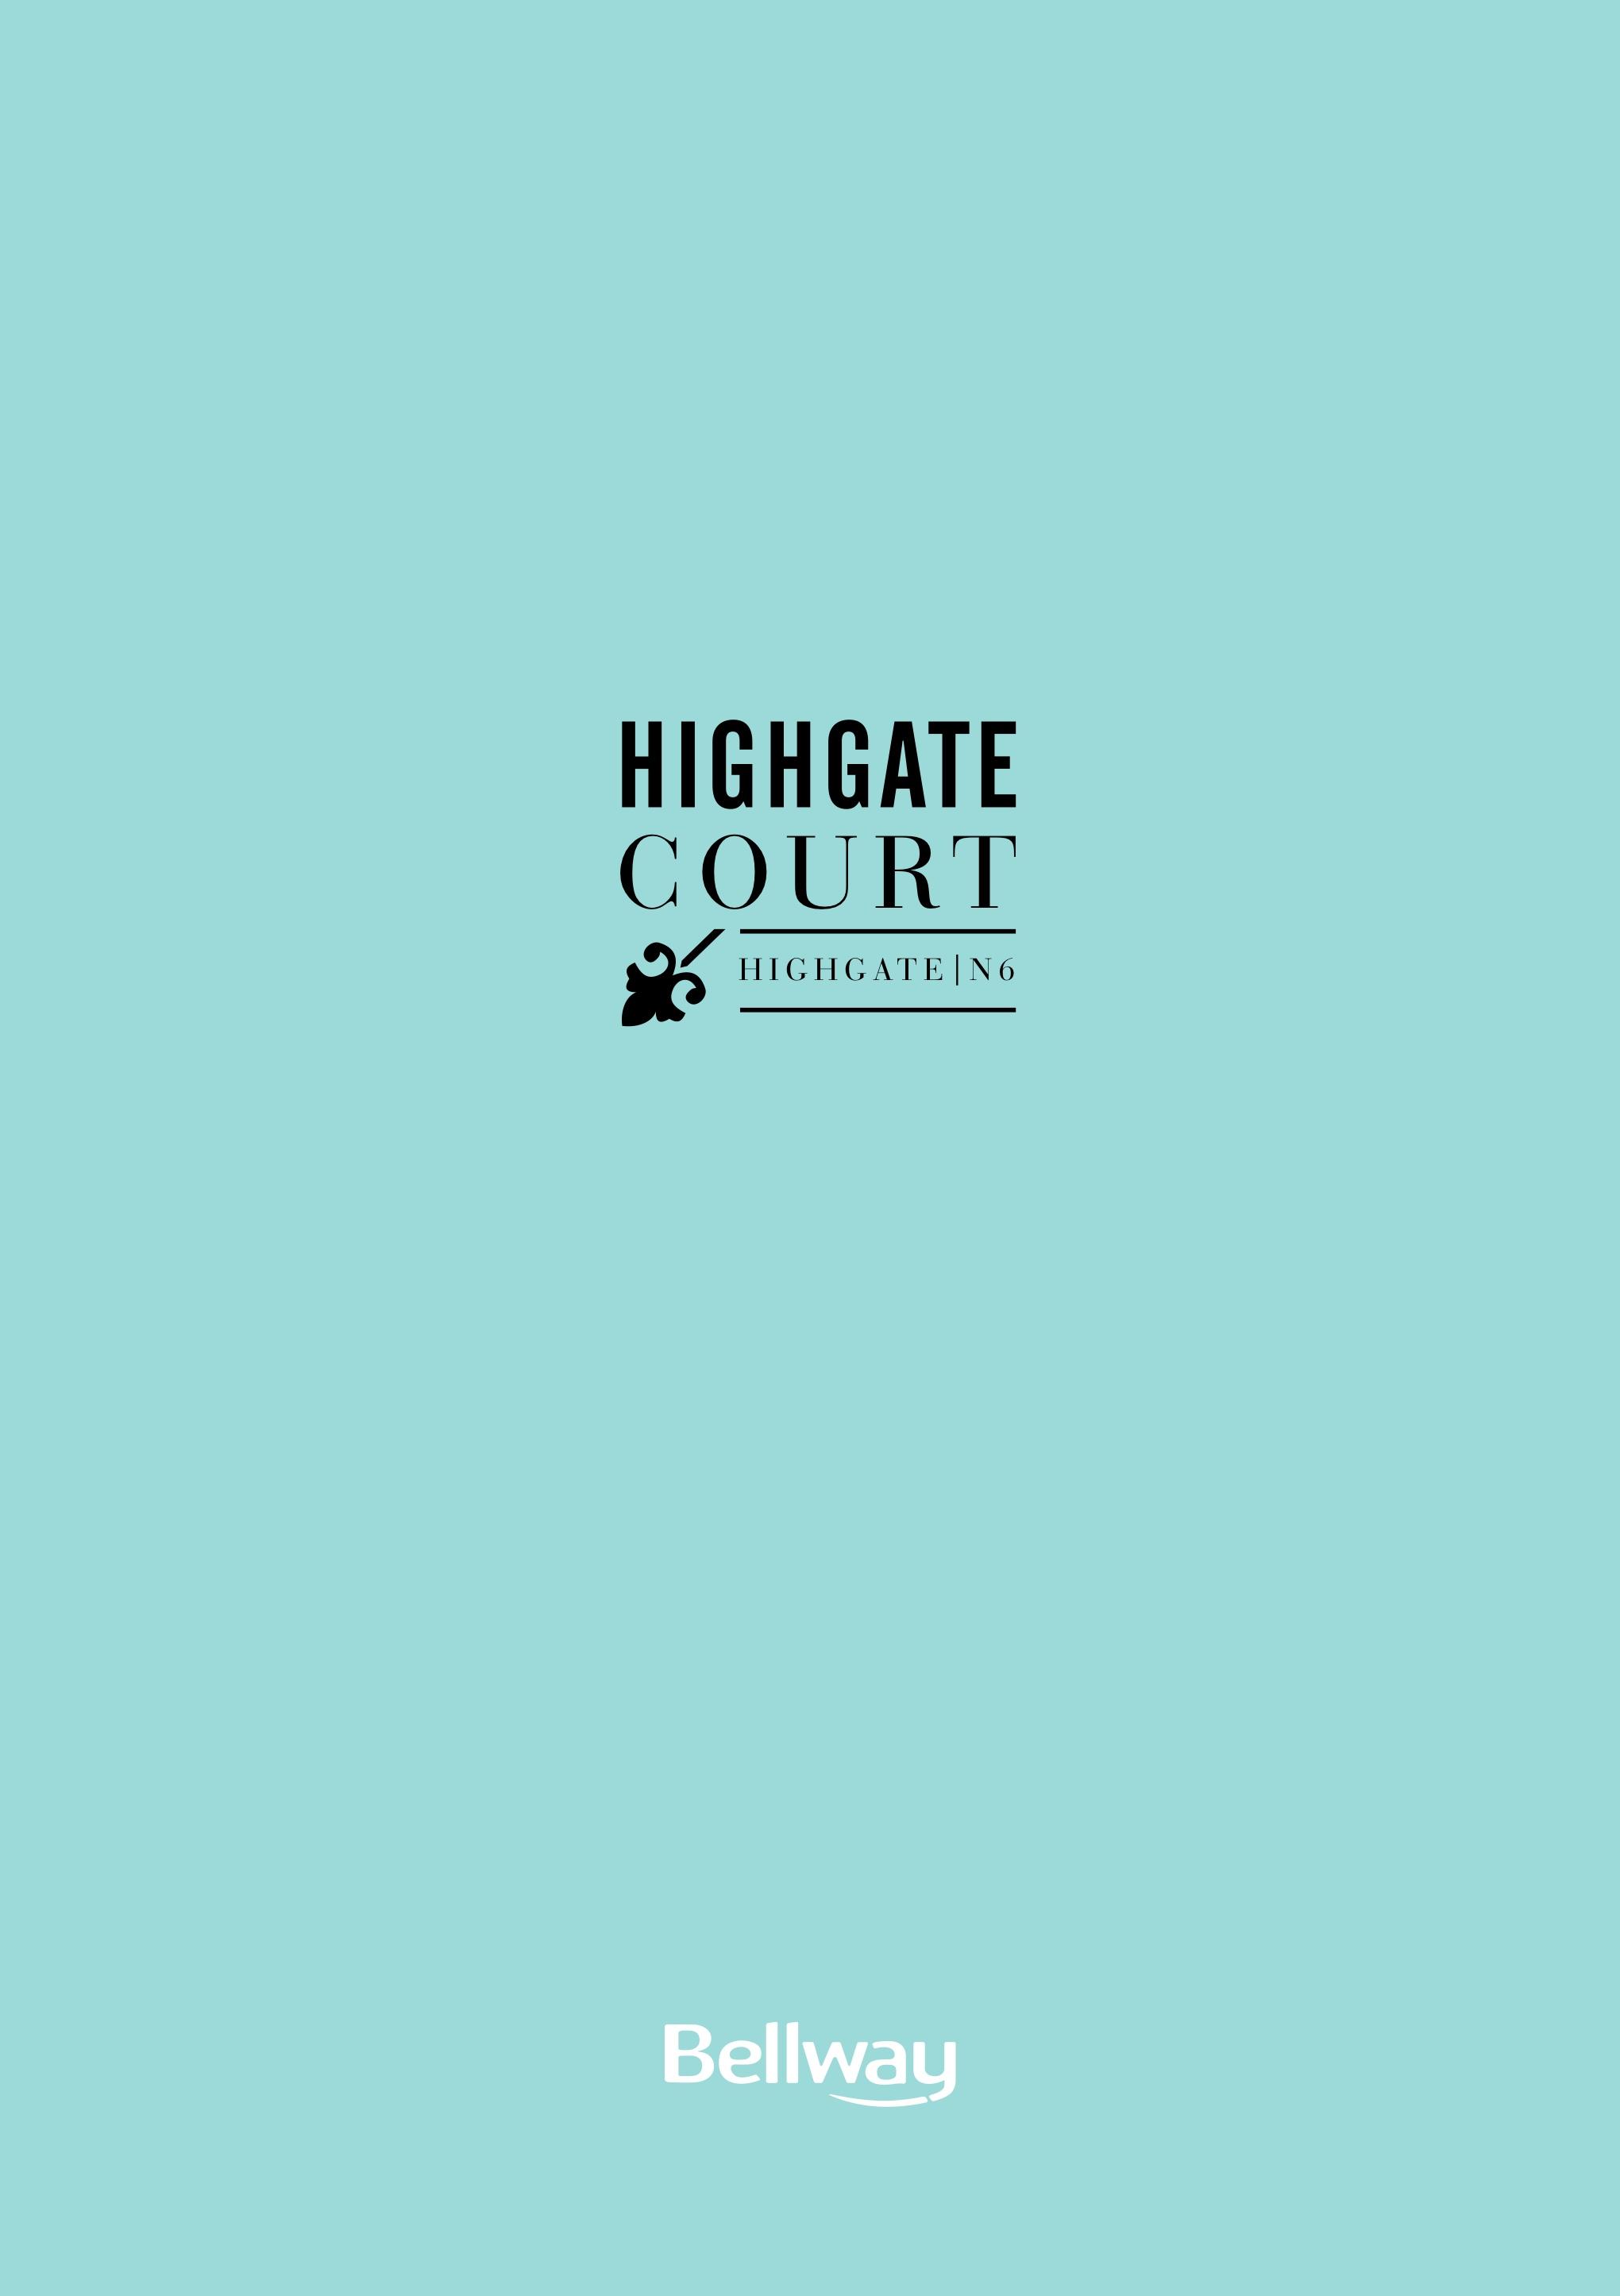 Highgate Court